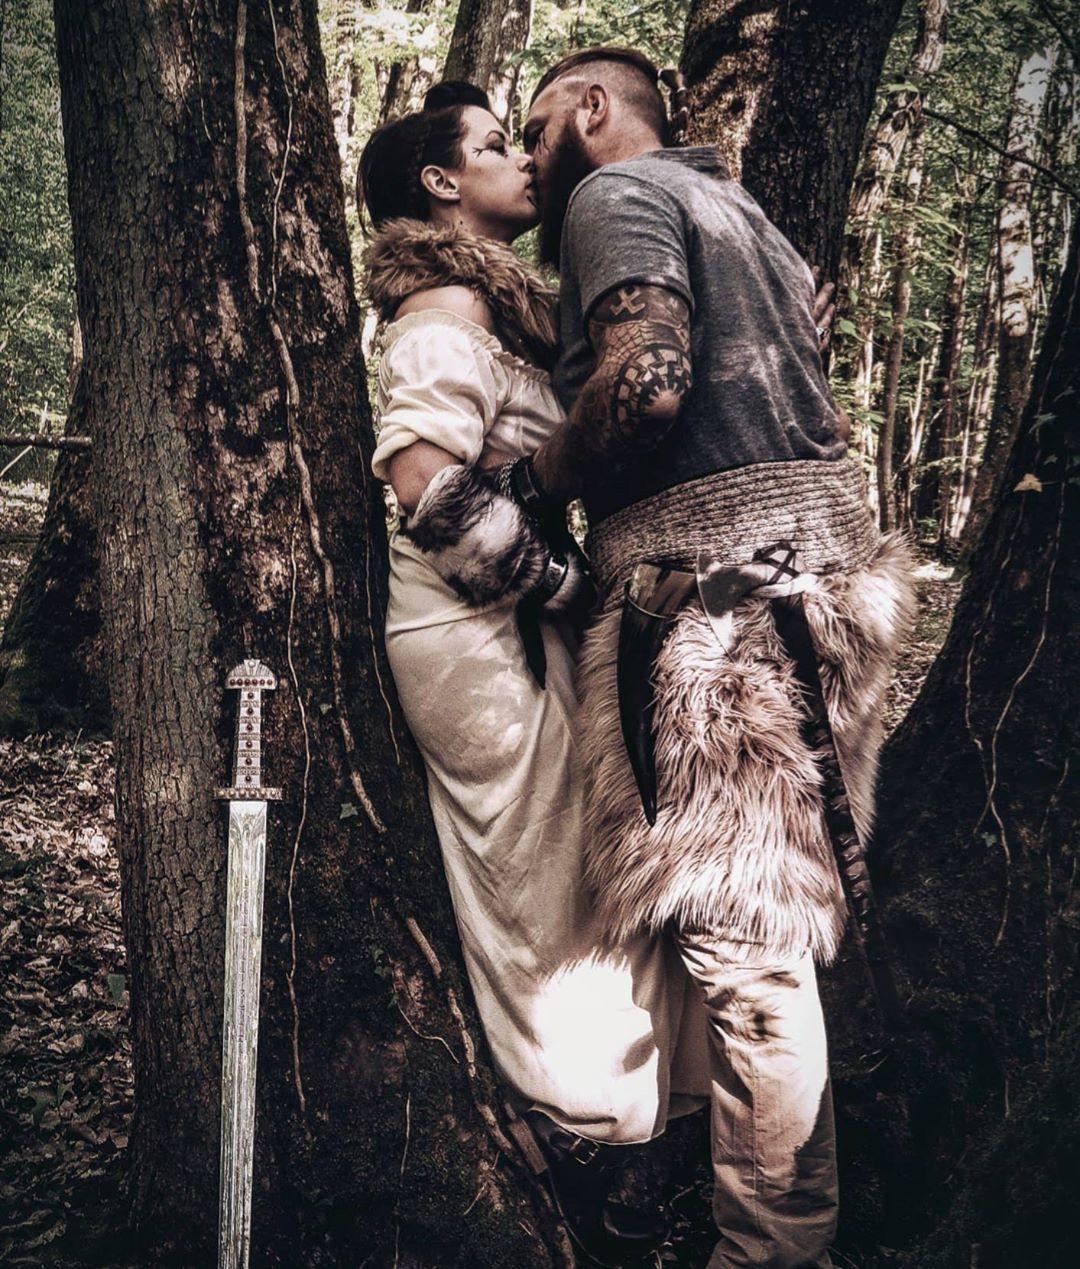 🍀🌱🌿🌱🍀 ... little relaxation break in nature ... 🍀🌱🌿🌱🍀 🧭🐒🧭🐒🧭🐒🧭🐒🧭🐒🧭🐒🧭🐒 French_vikings_famiily  #relaxation #break #natural #nature_seekers #naturelovers #naturephotography #wood #paganwood #pagan #paganism #paganfamily #sword #axe #ragnarsword #ragnarlothbrok #vikings #medieval #medievalart #modernviking #fauxfur #tattoos #tattoostyle #handtattoo #norsemythology #norsepagan #norseman #norsewoman #berserker #valkyrie